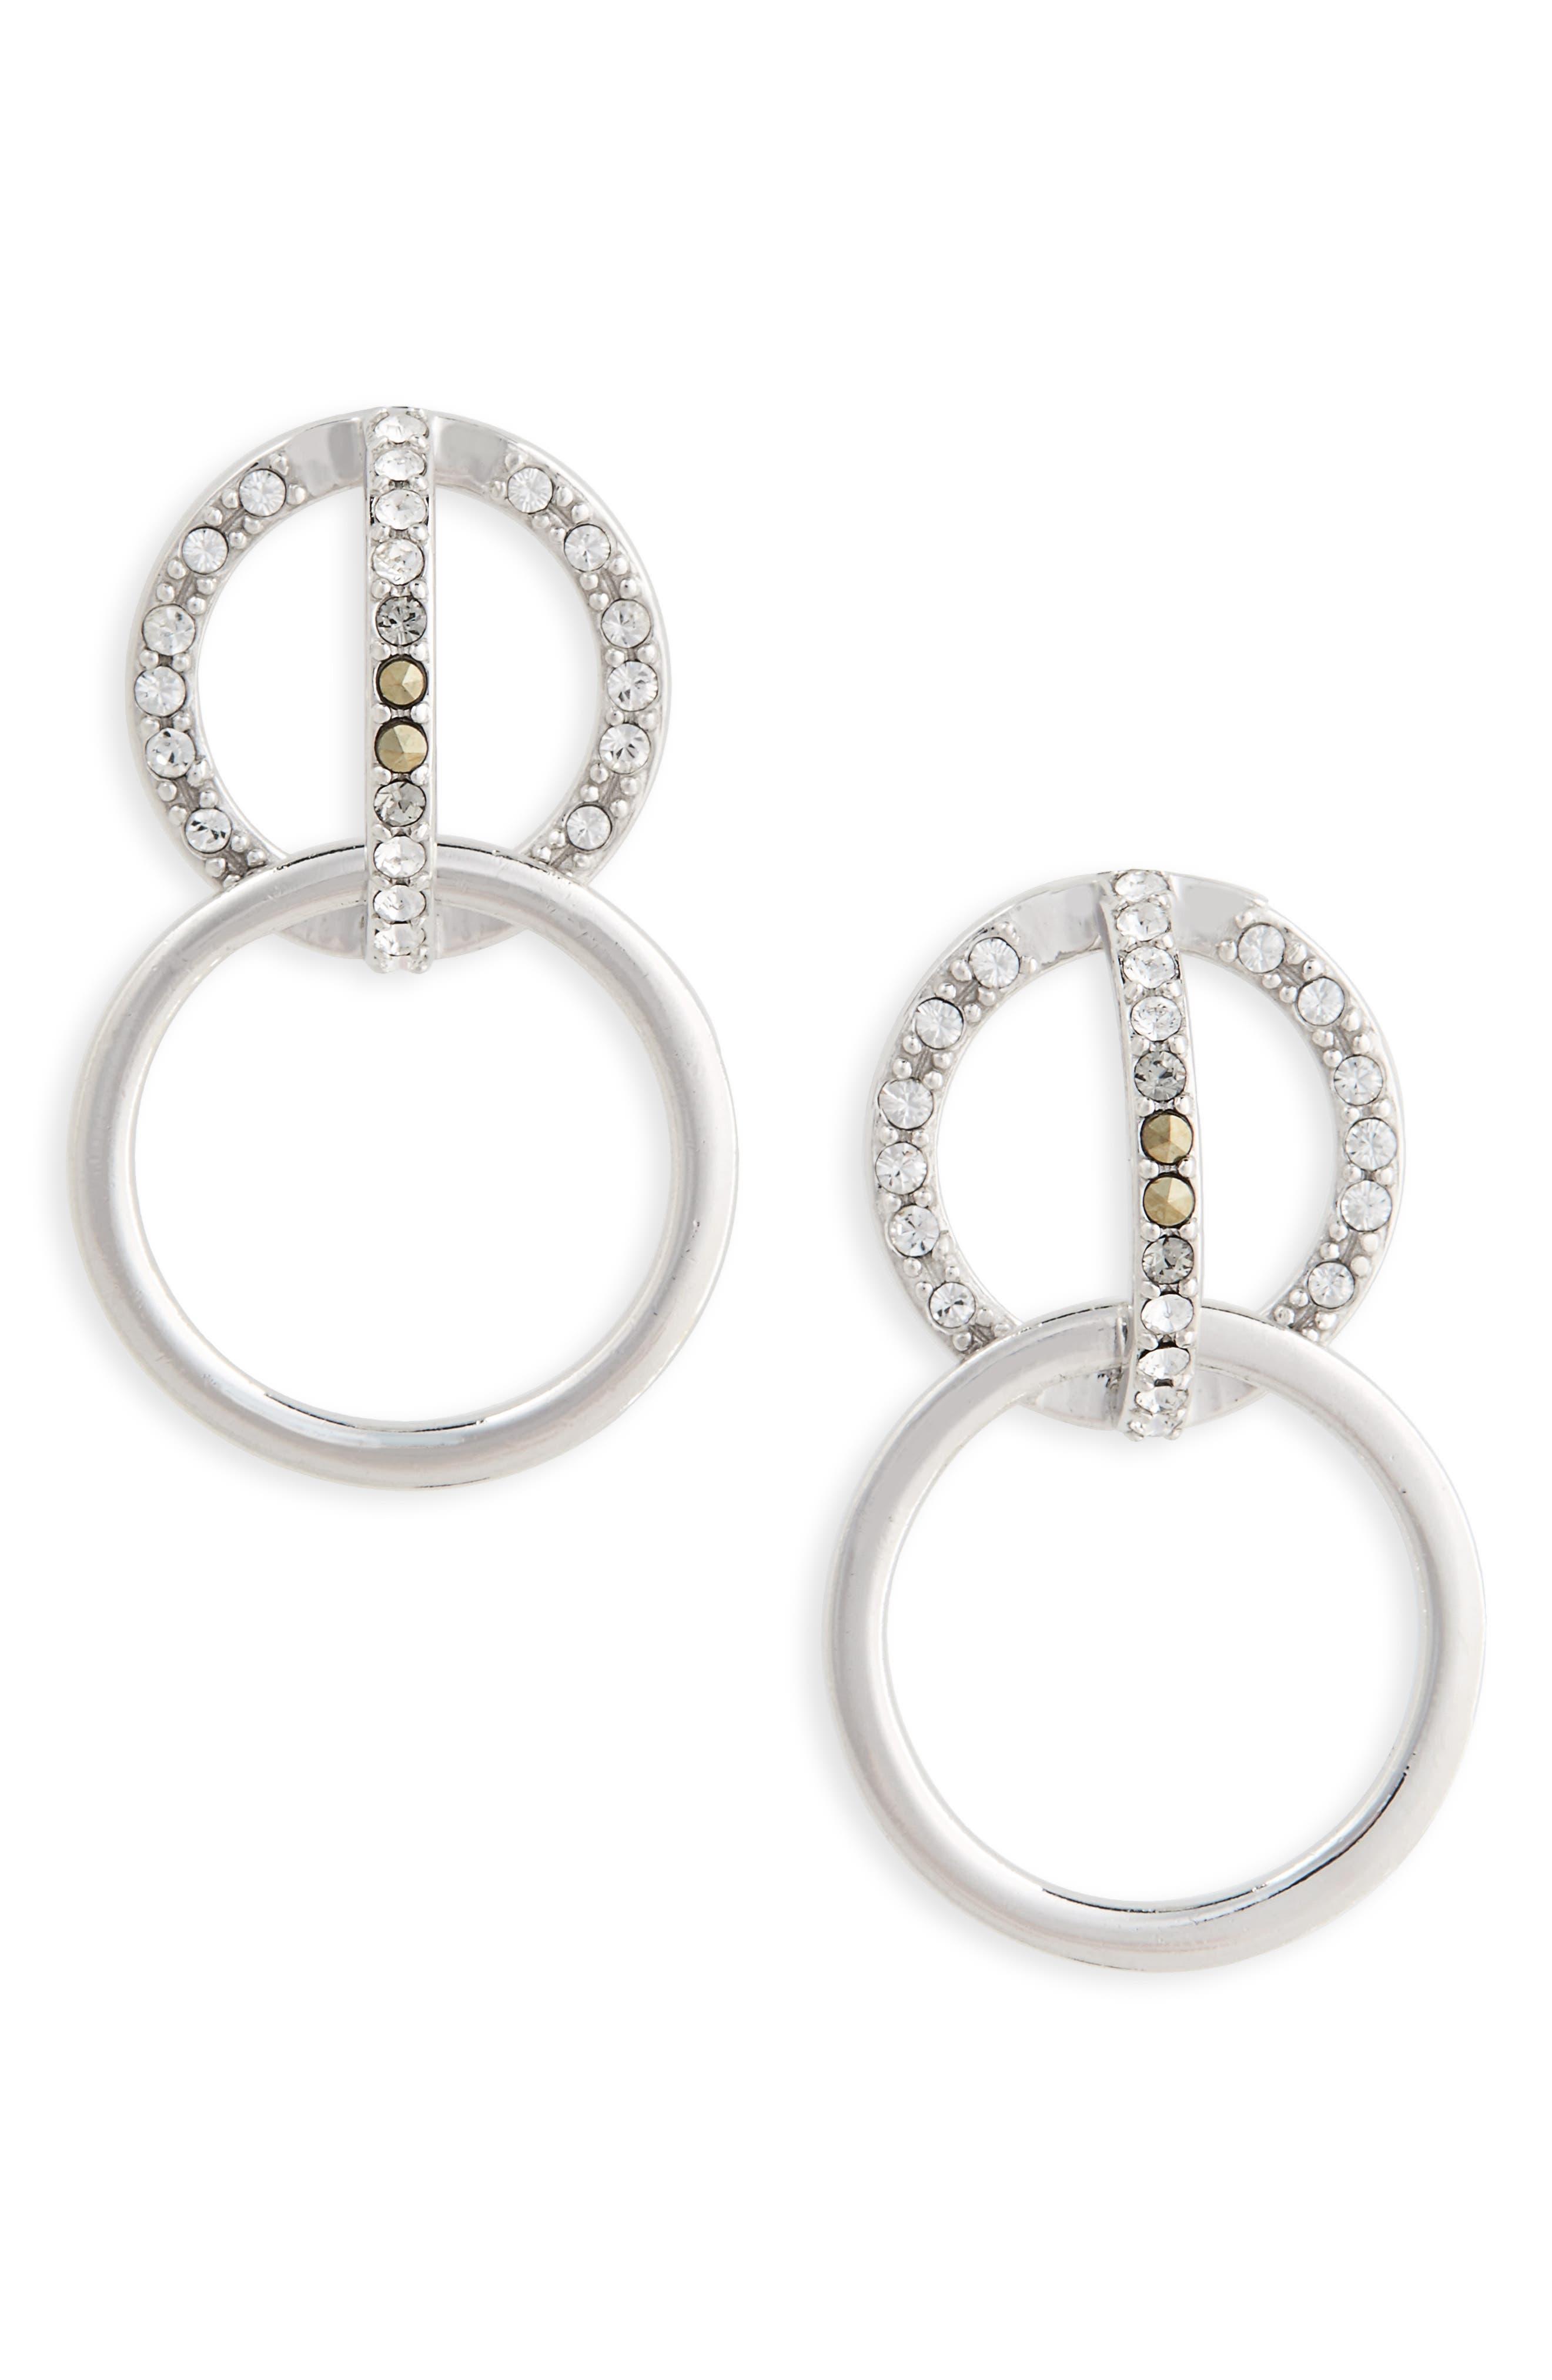 Alternate Image 1 Selected - Judith Jack Silver Sparkle Double Drop Earrings